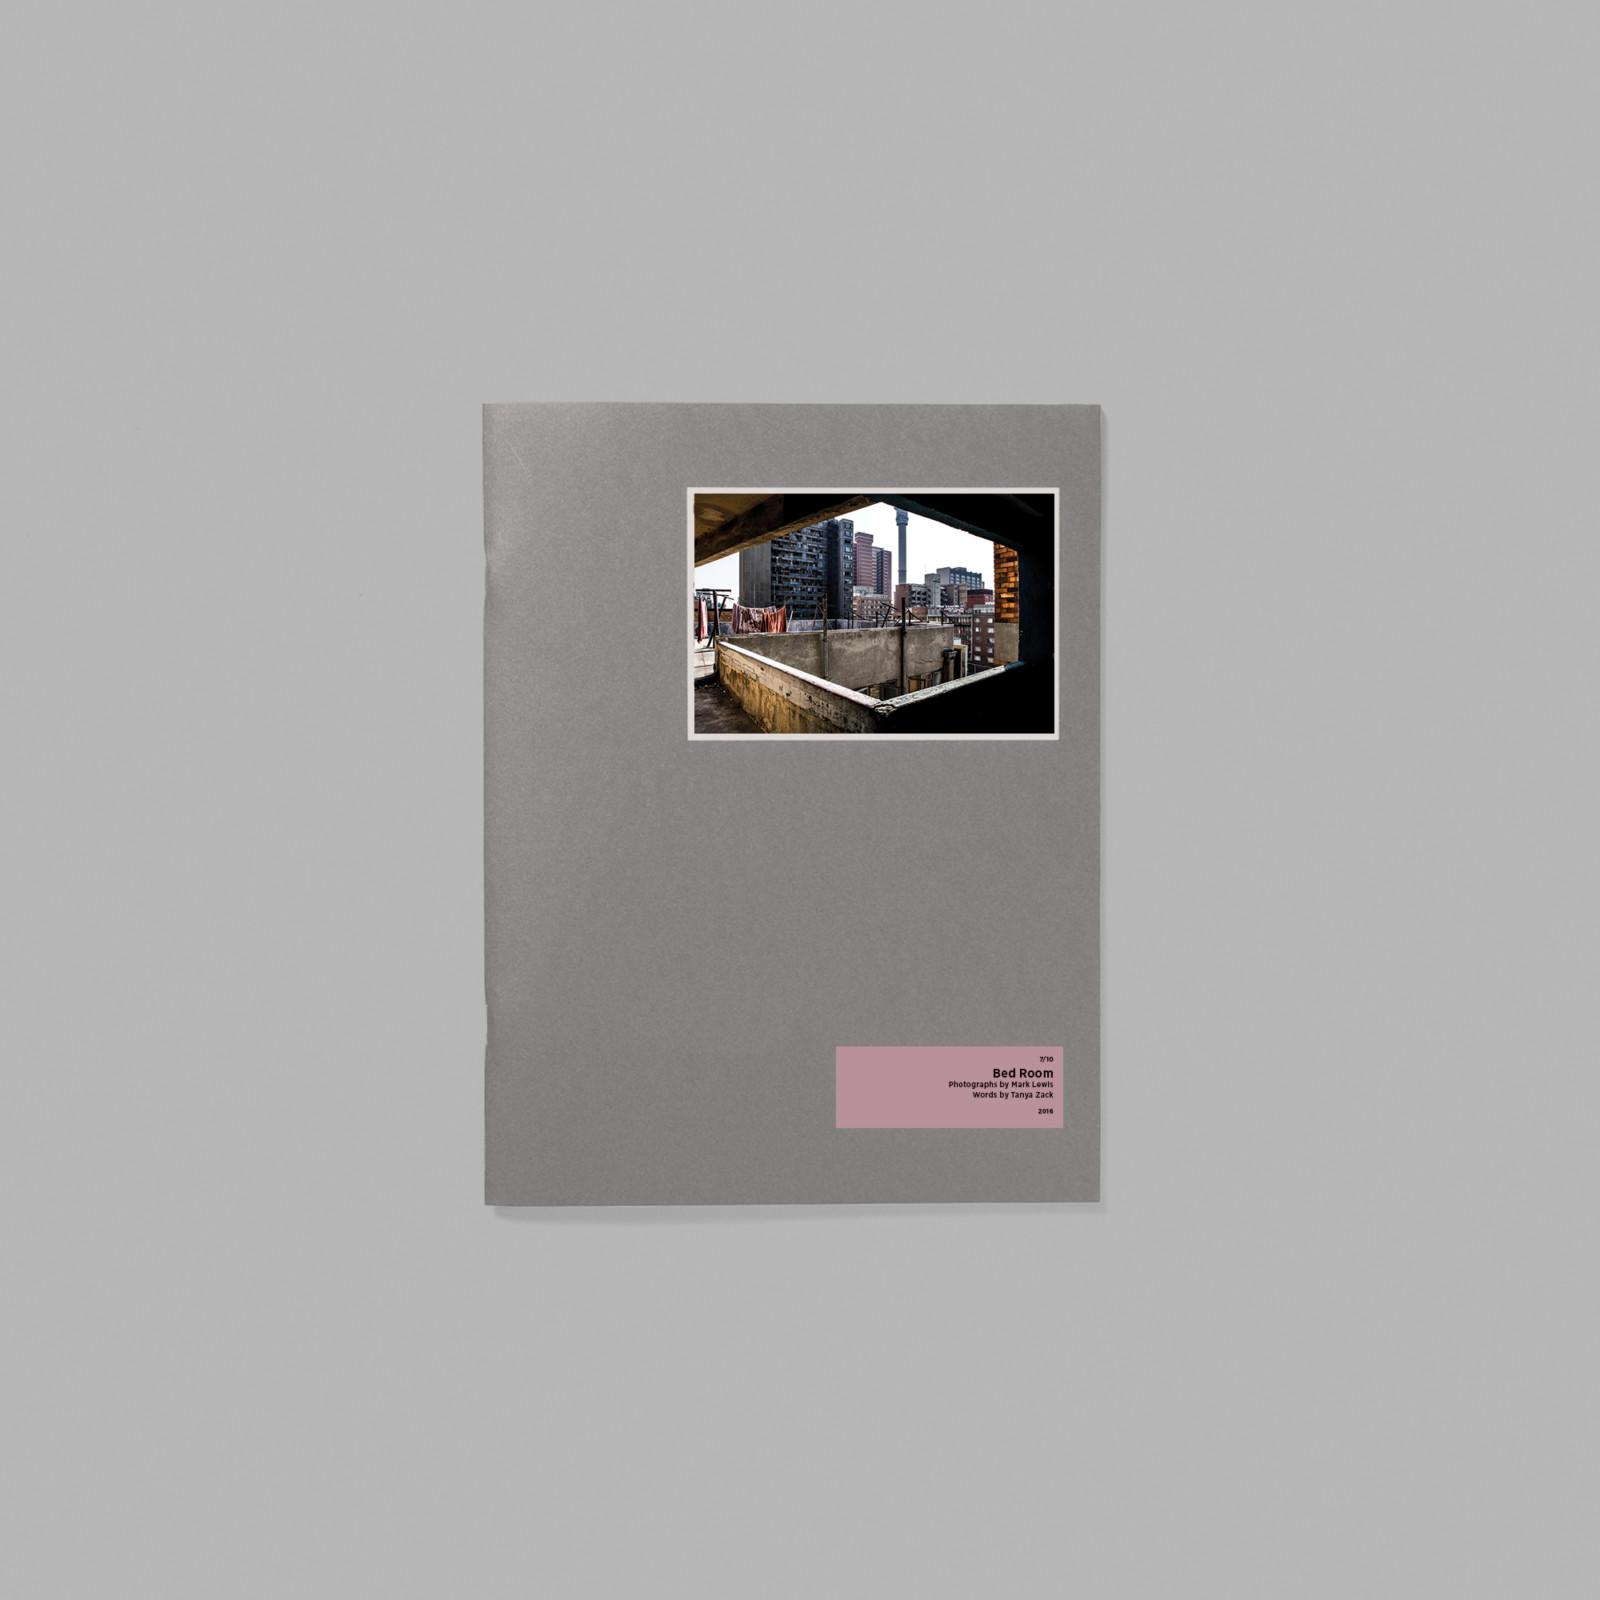 fw_mark-lewis-tanya-zack_product-image